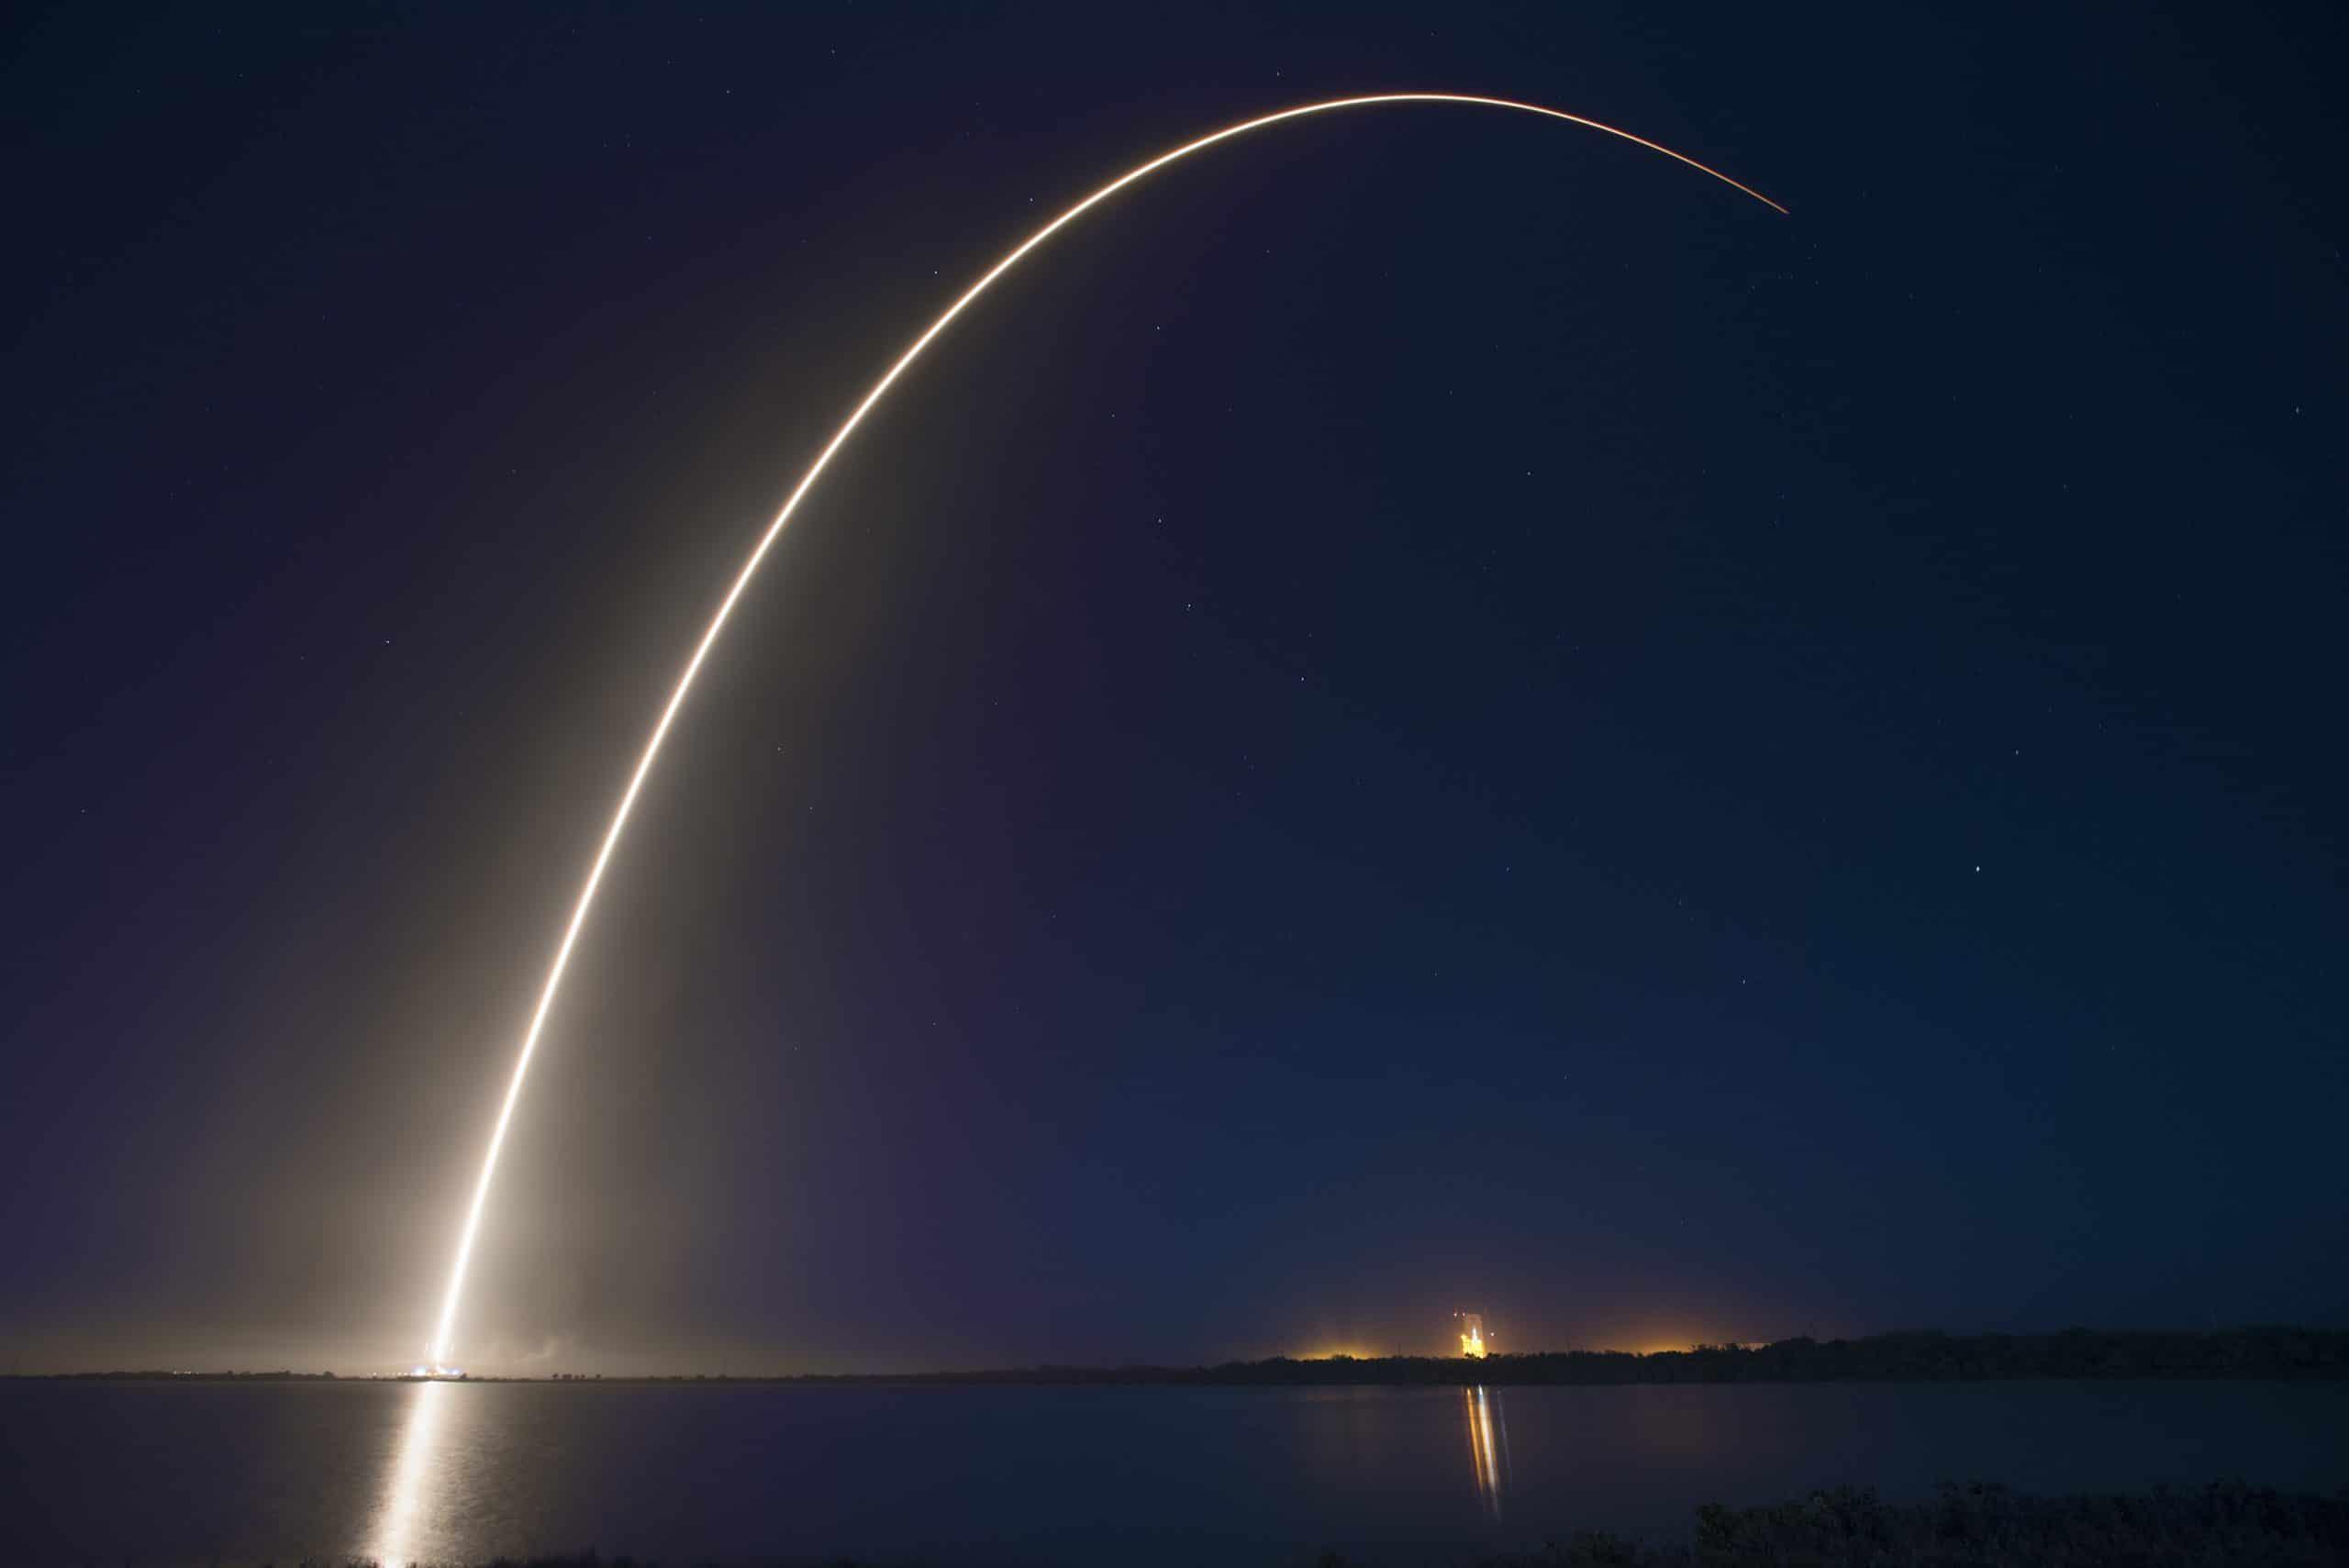 g network rocket scaled